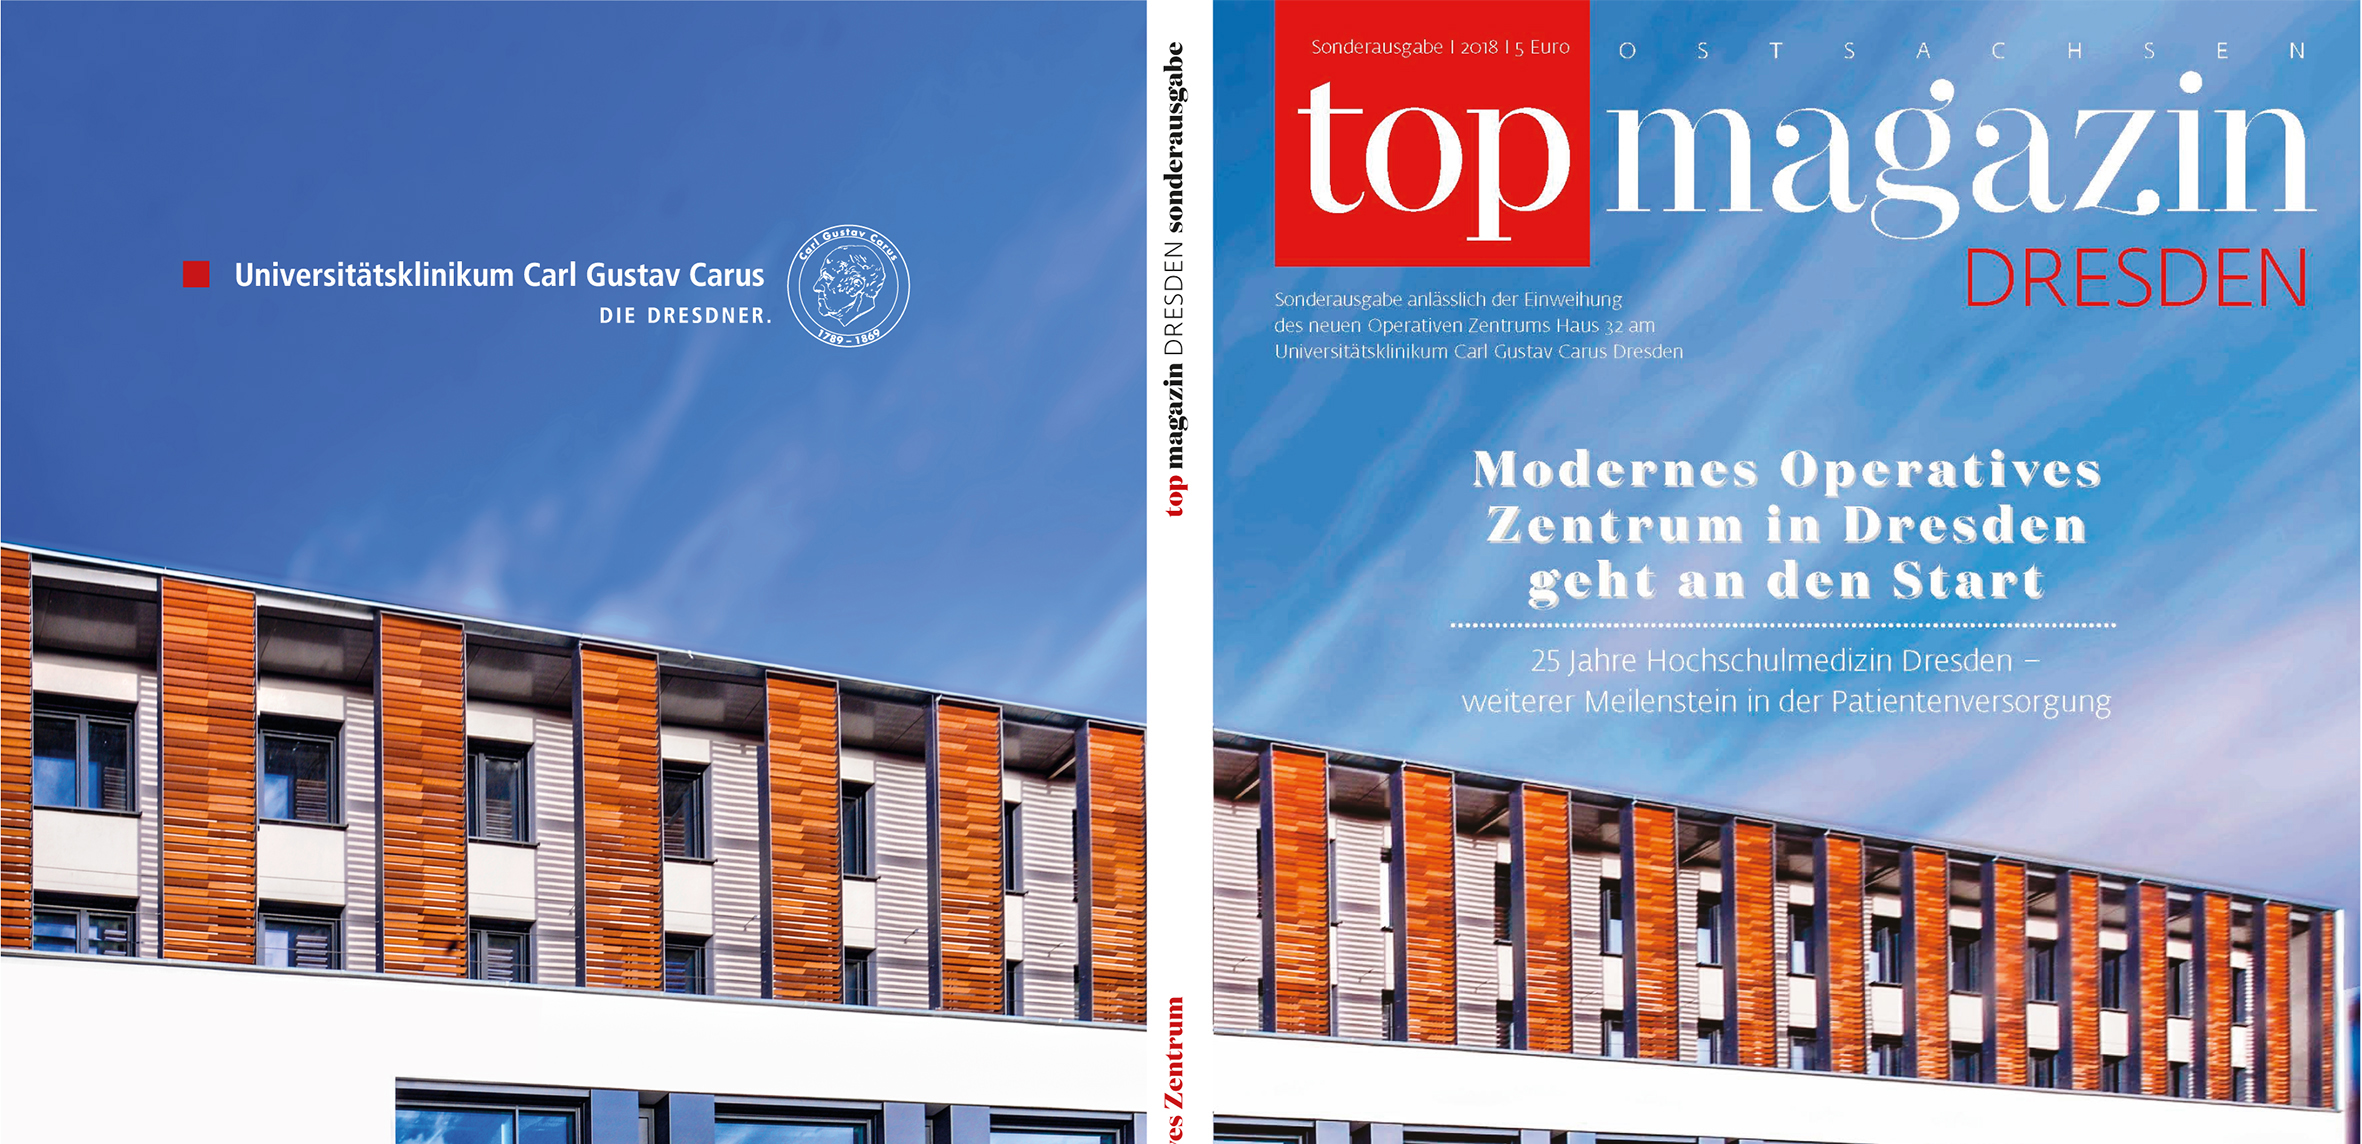 Neues Operatives Zentrum am UKD - Top Magazin Dresden